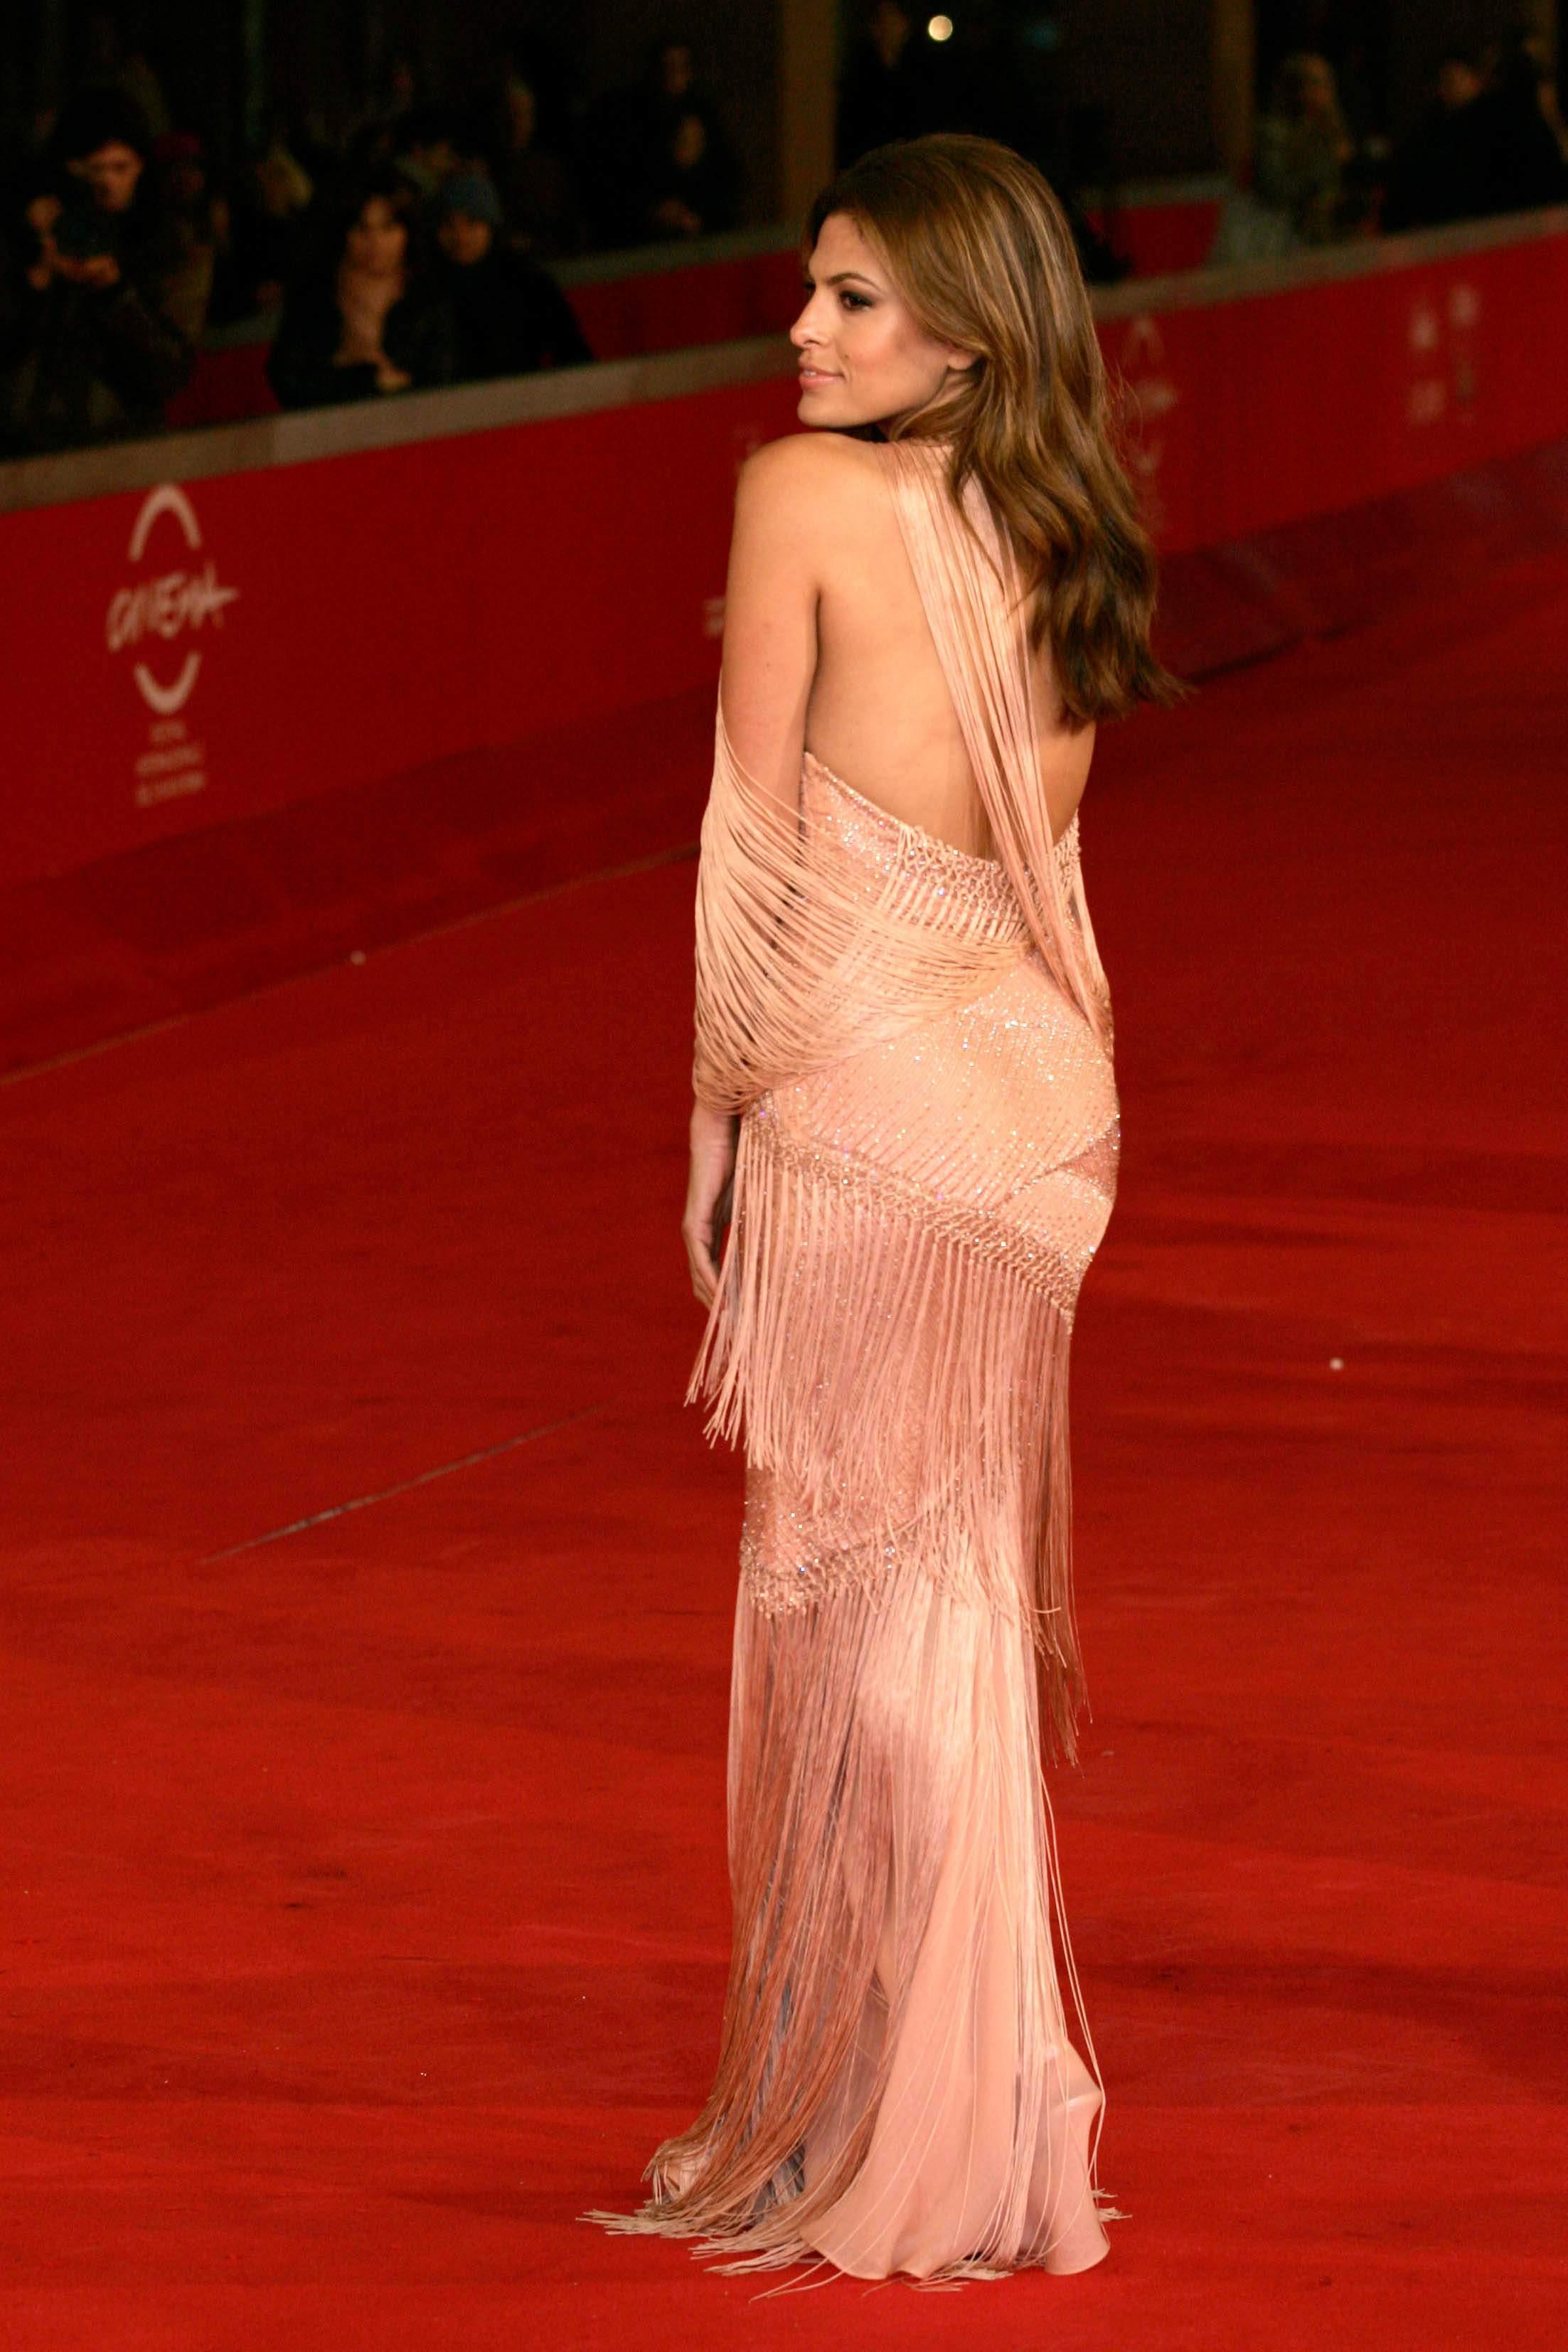 Eva Mendes premiere 01 122 260 lo